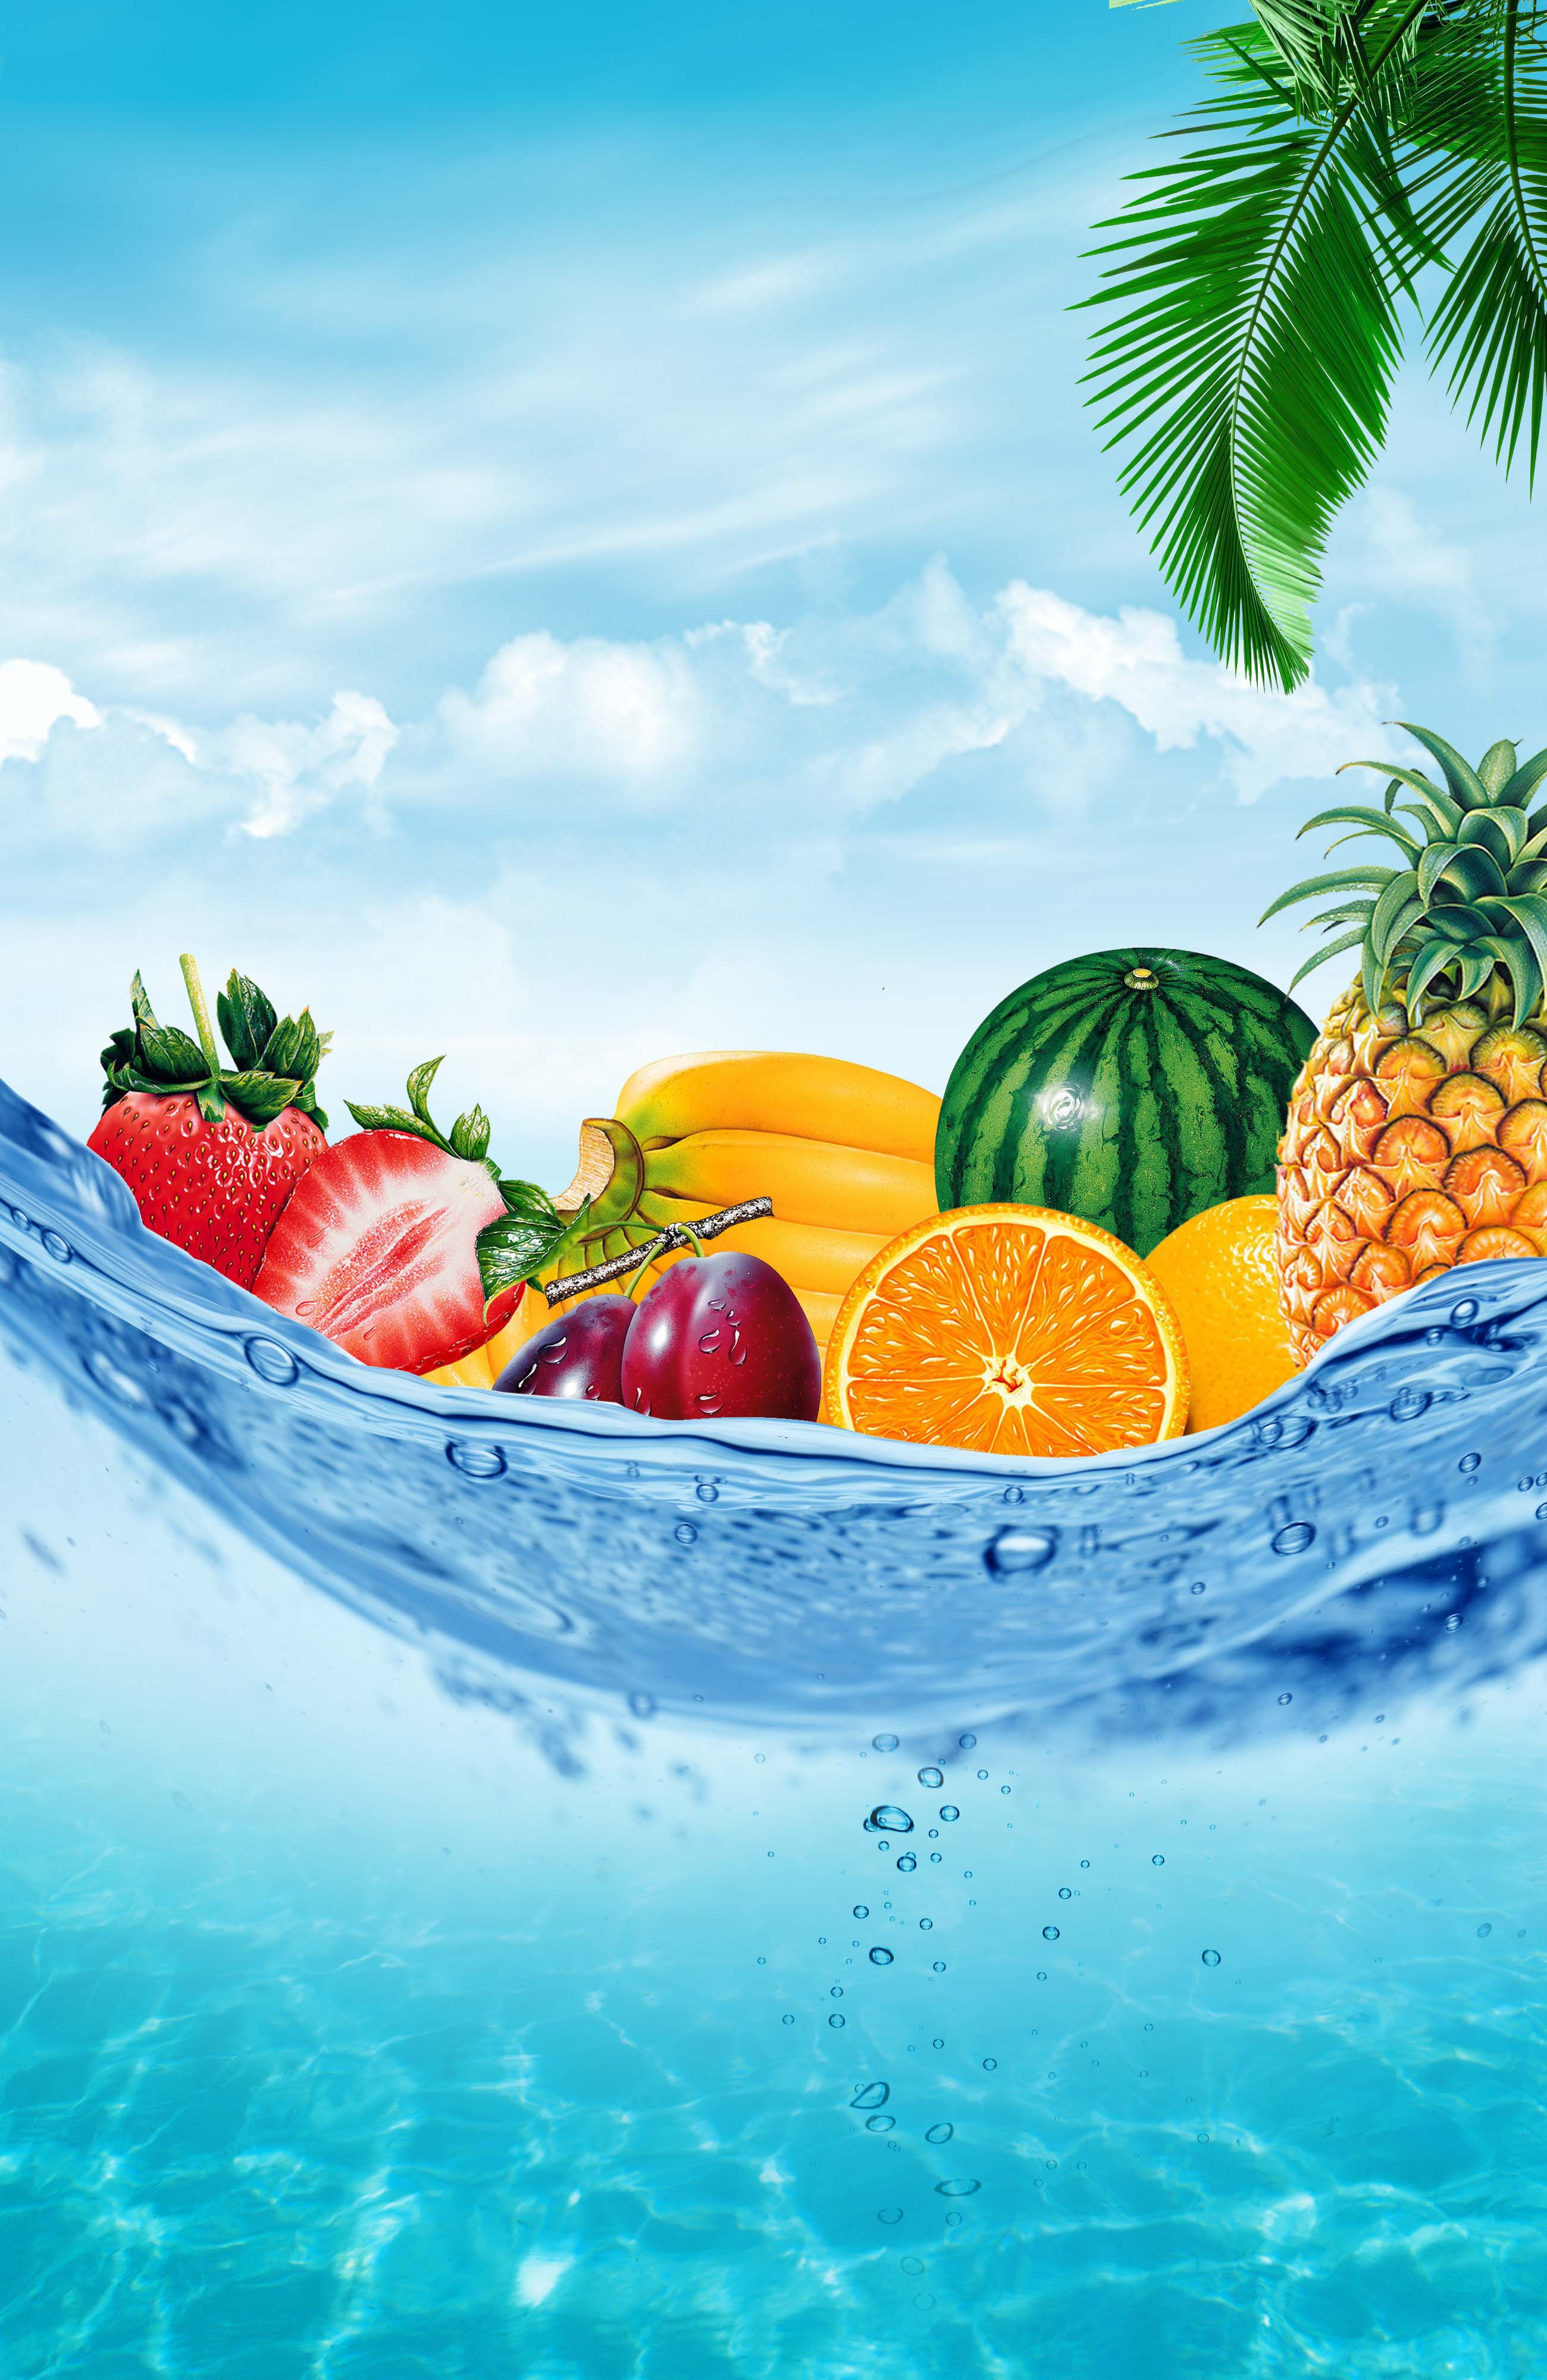 la nourriture l u00e9gumes vitamine frais contexte le r u00e9gime